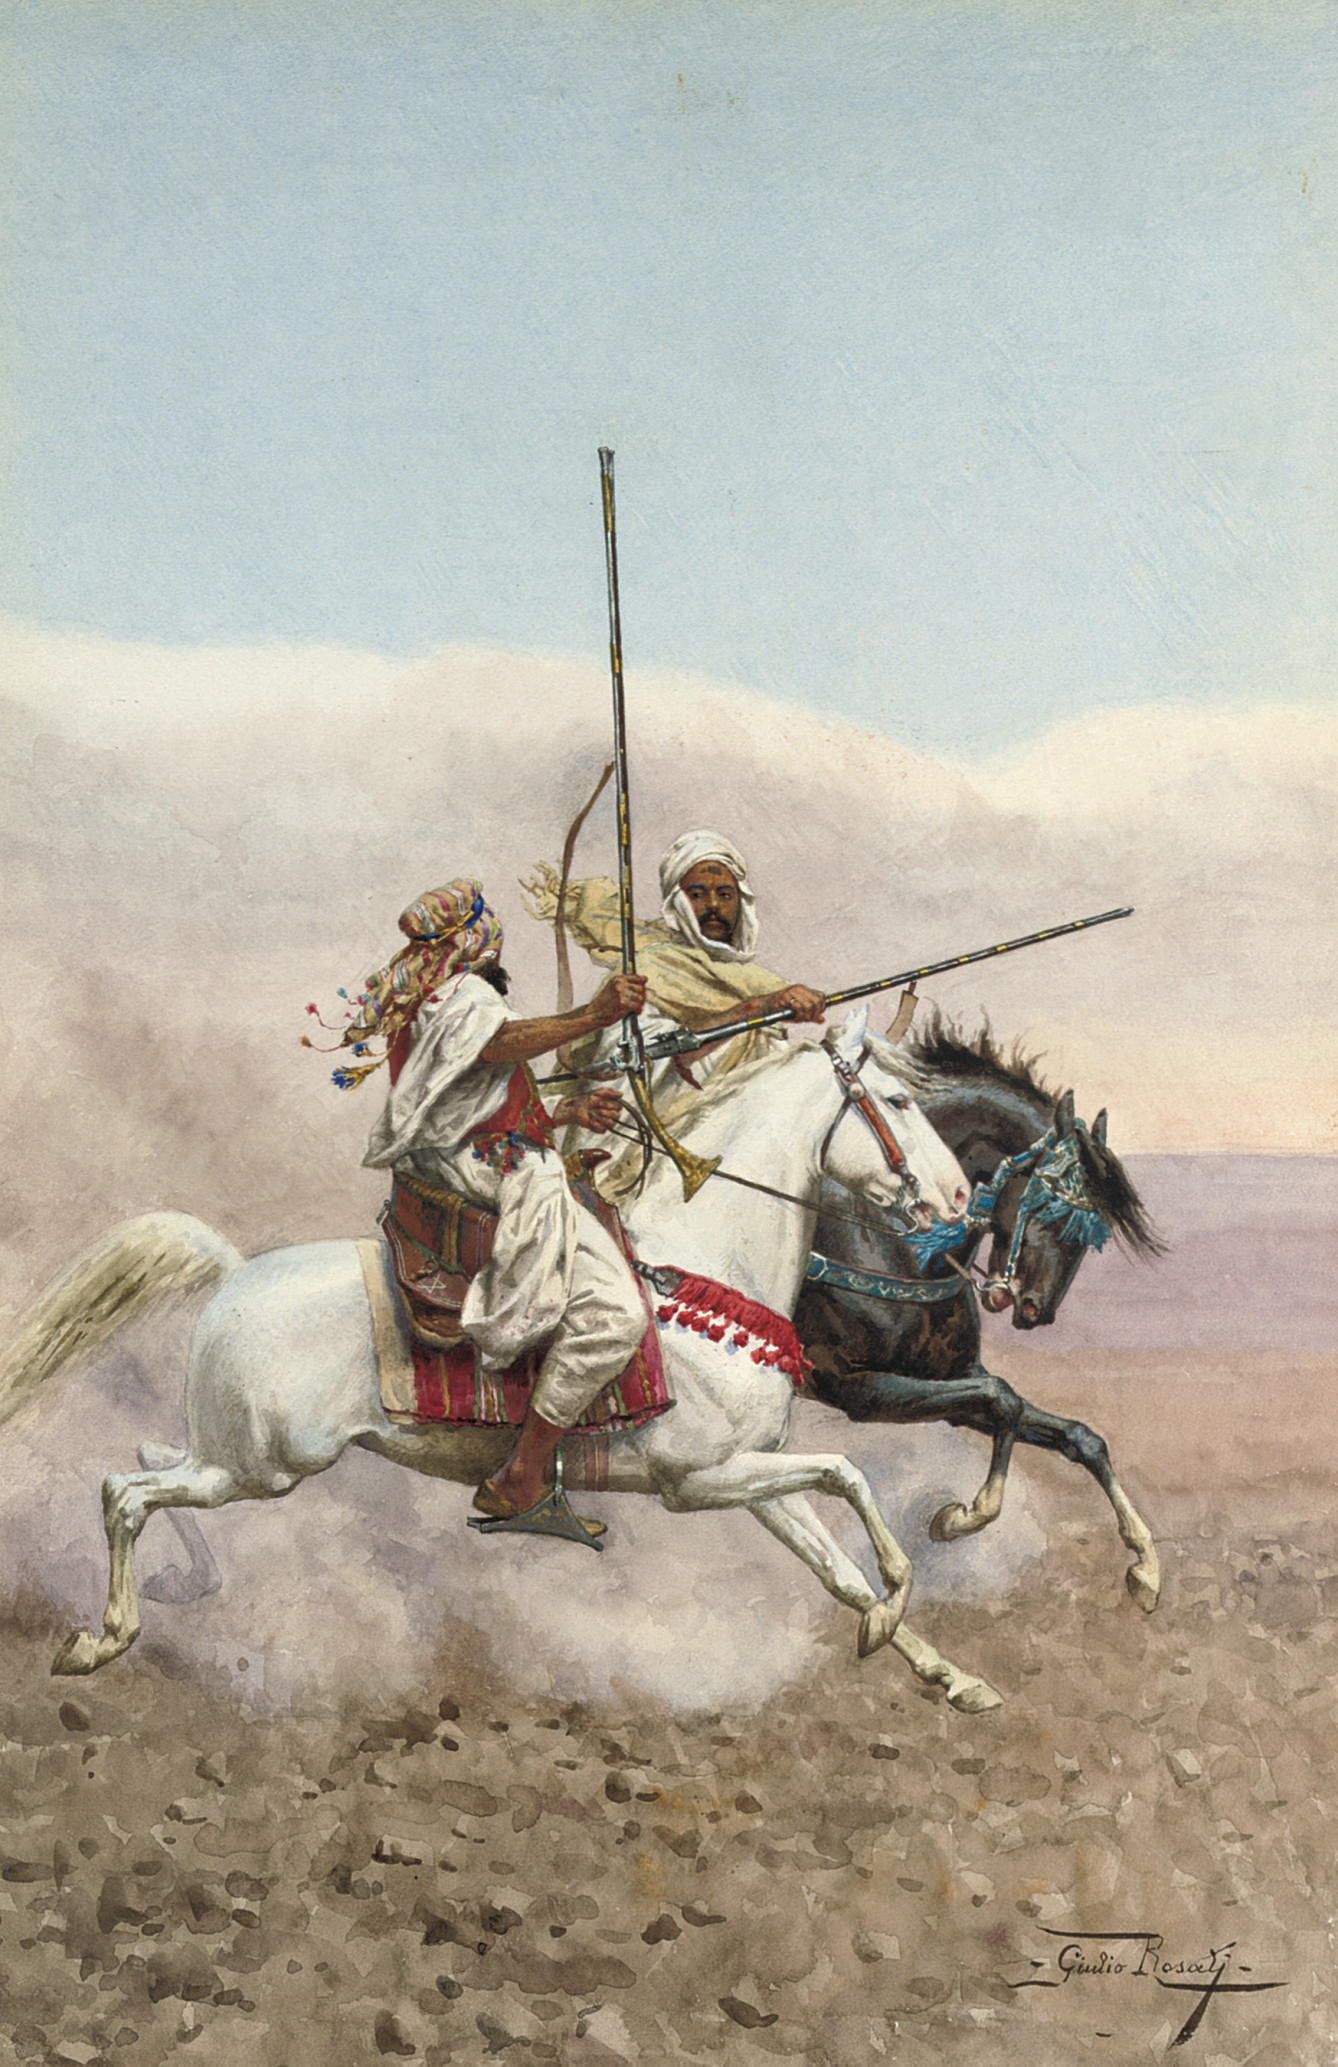 Two Arab horsemen